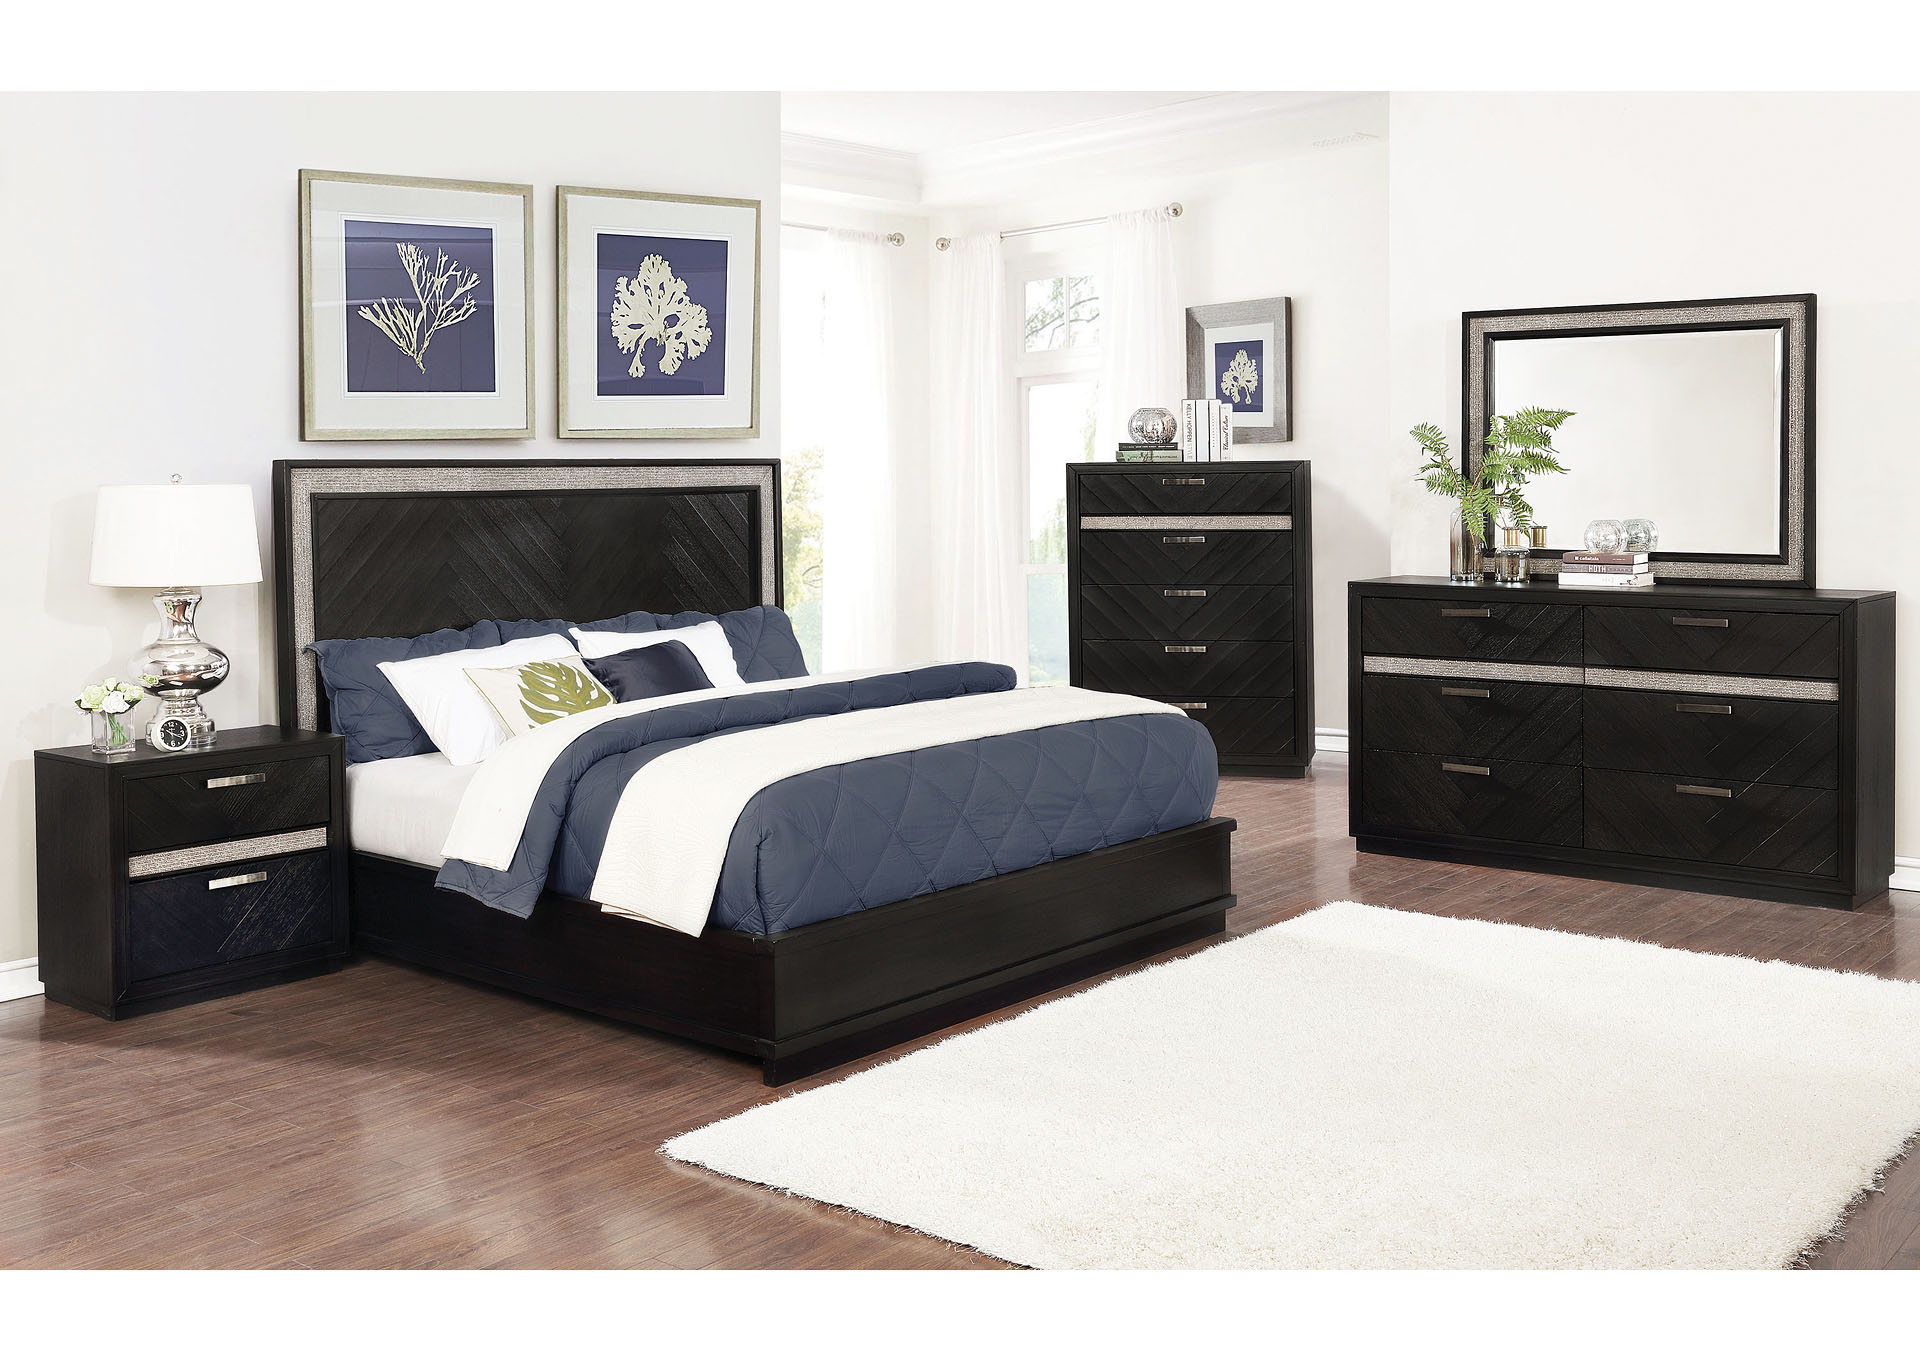 Cararra 3 Piece Queen Bedroom Set Oak Furniture Liquidators